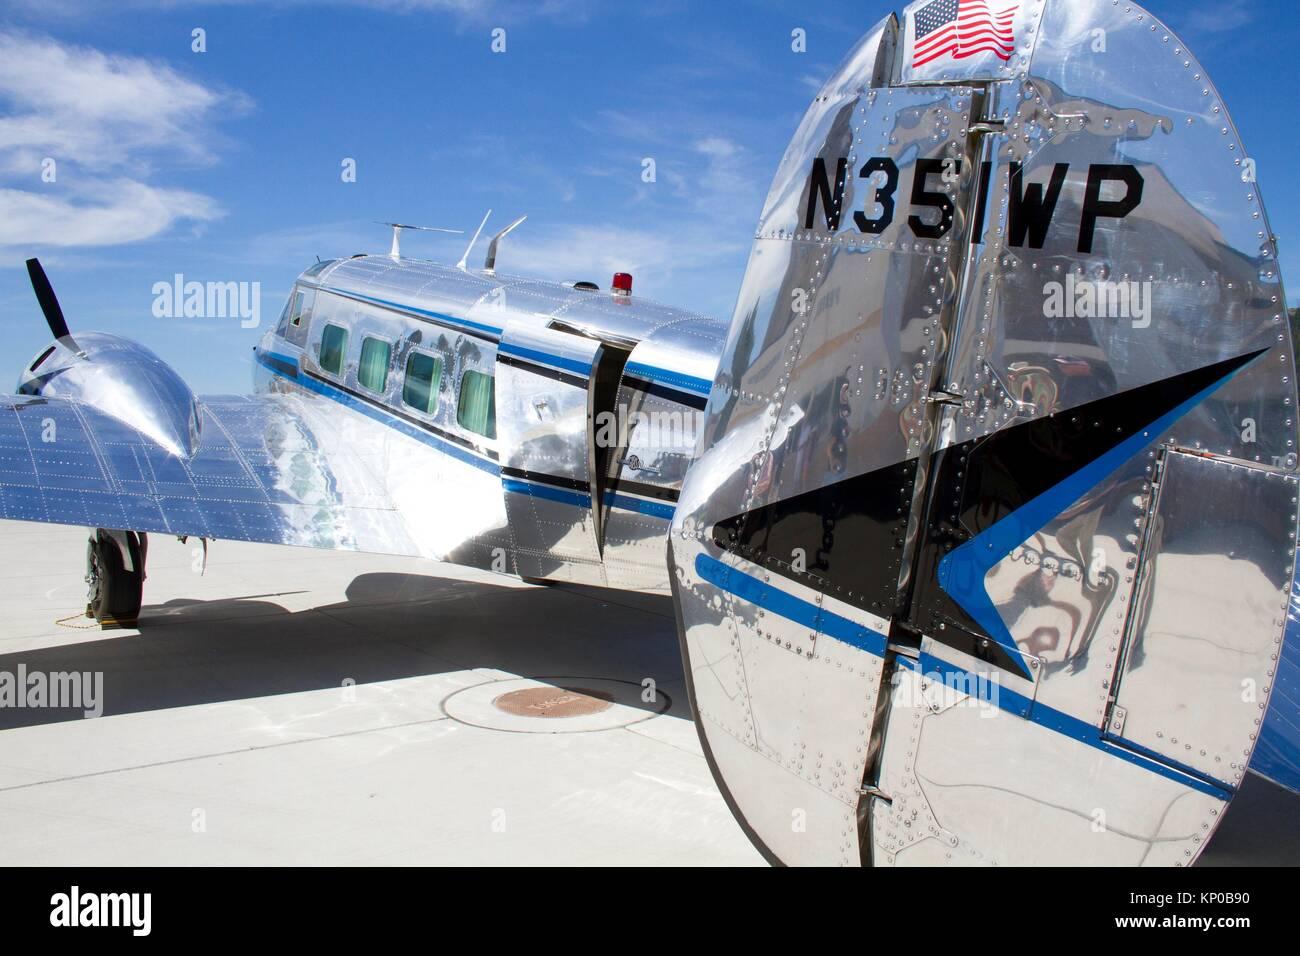 A Beechcraft 18 plane at an airshow in Spokane Valley, Washington, USA. - Stock Image